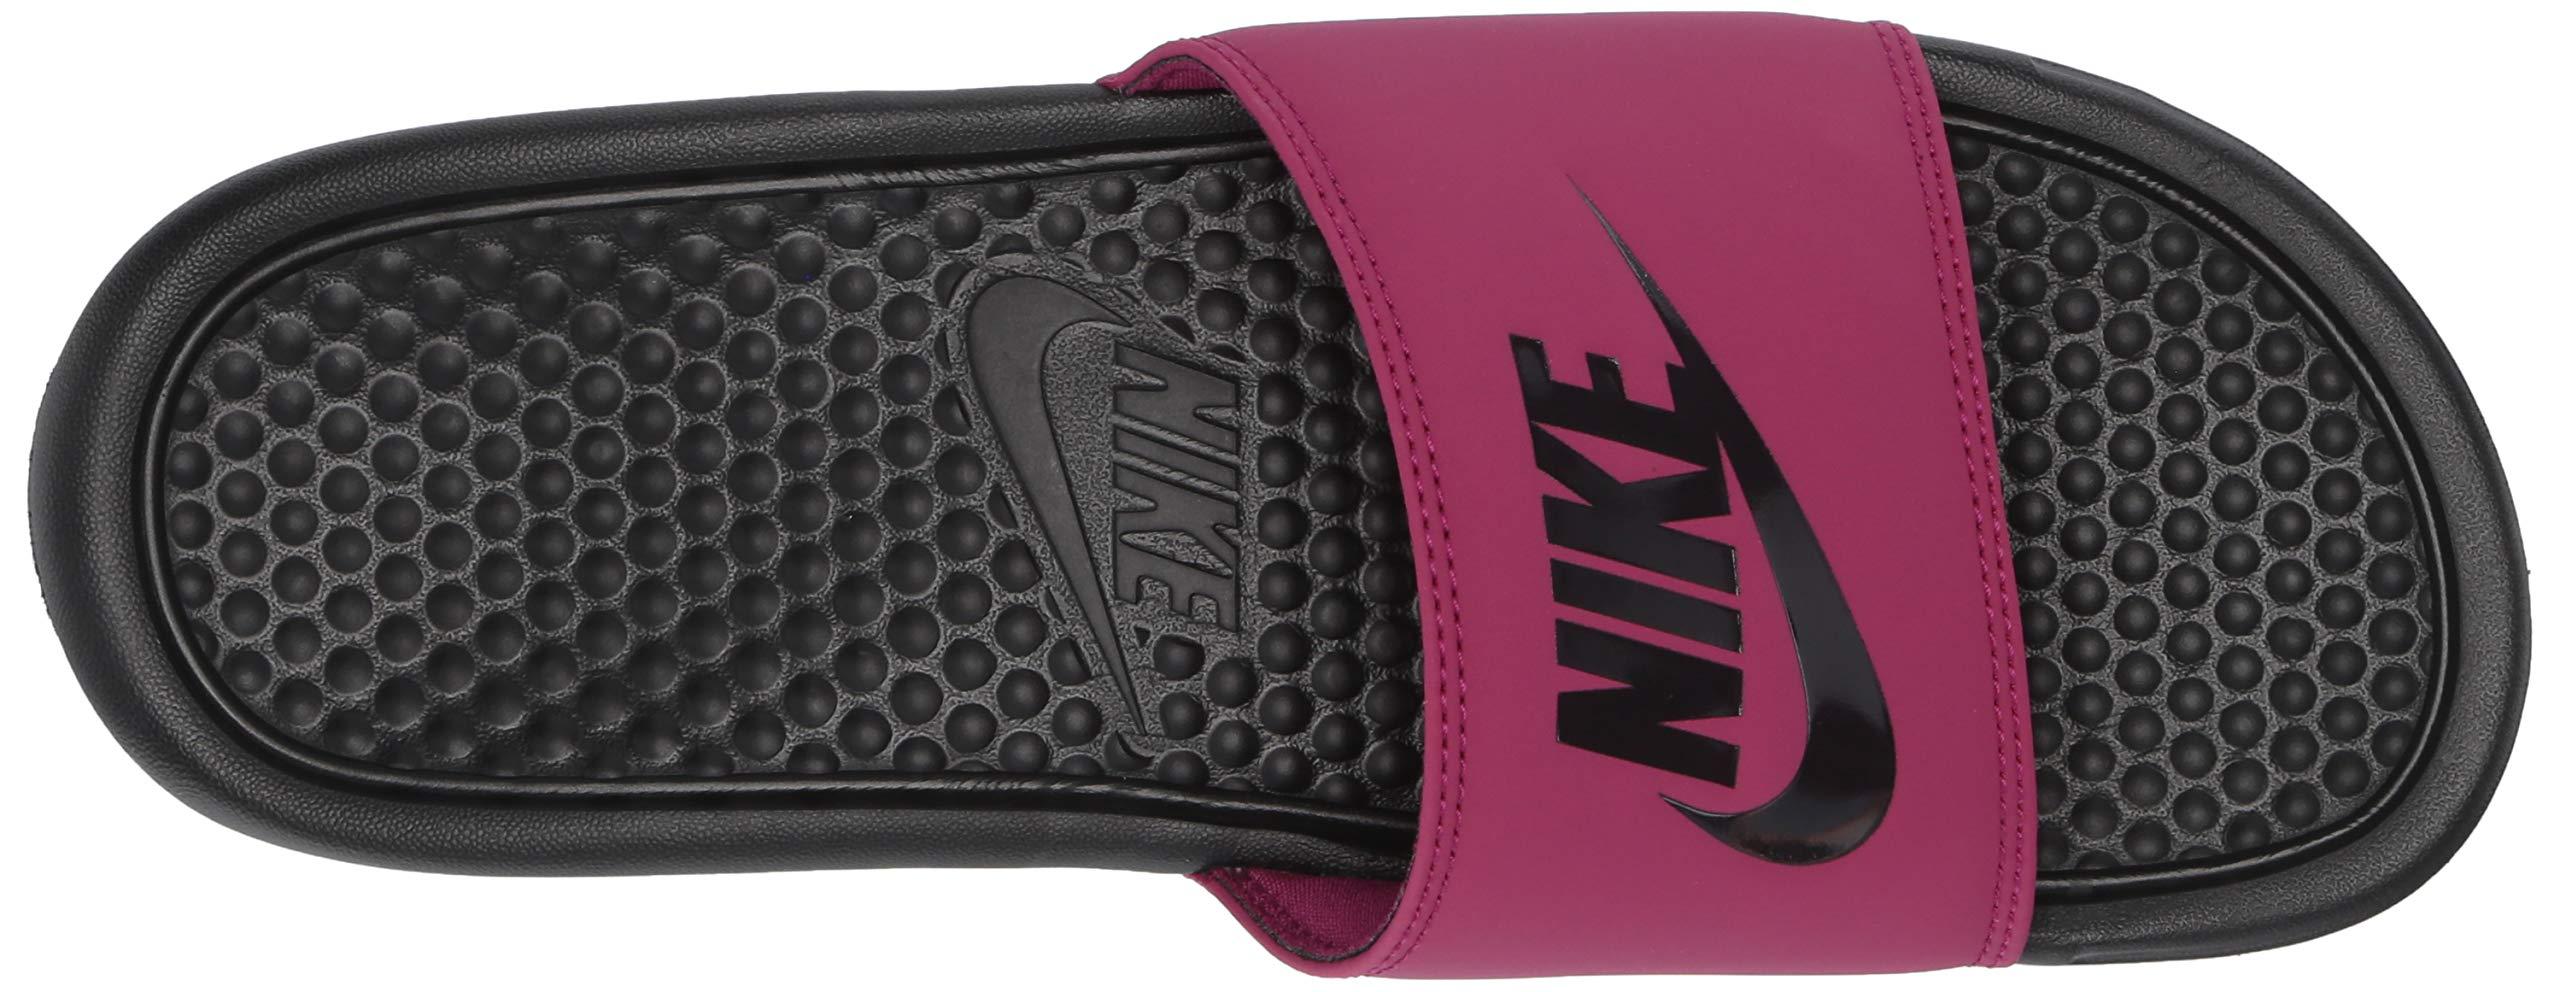 Nike Women's Benassi Just Do It Sandal, True Berry/Burgundy ash, 7 Regular US by Nike (Image #7)